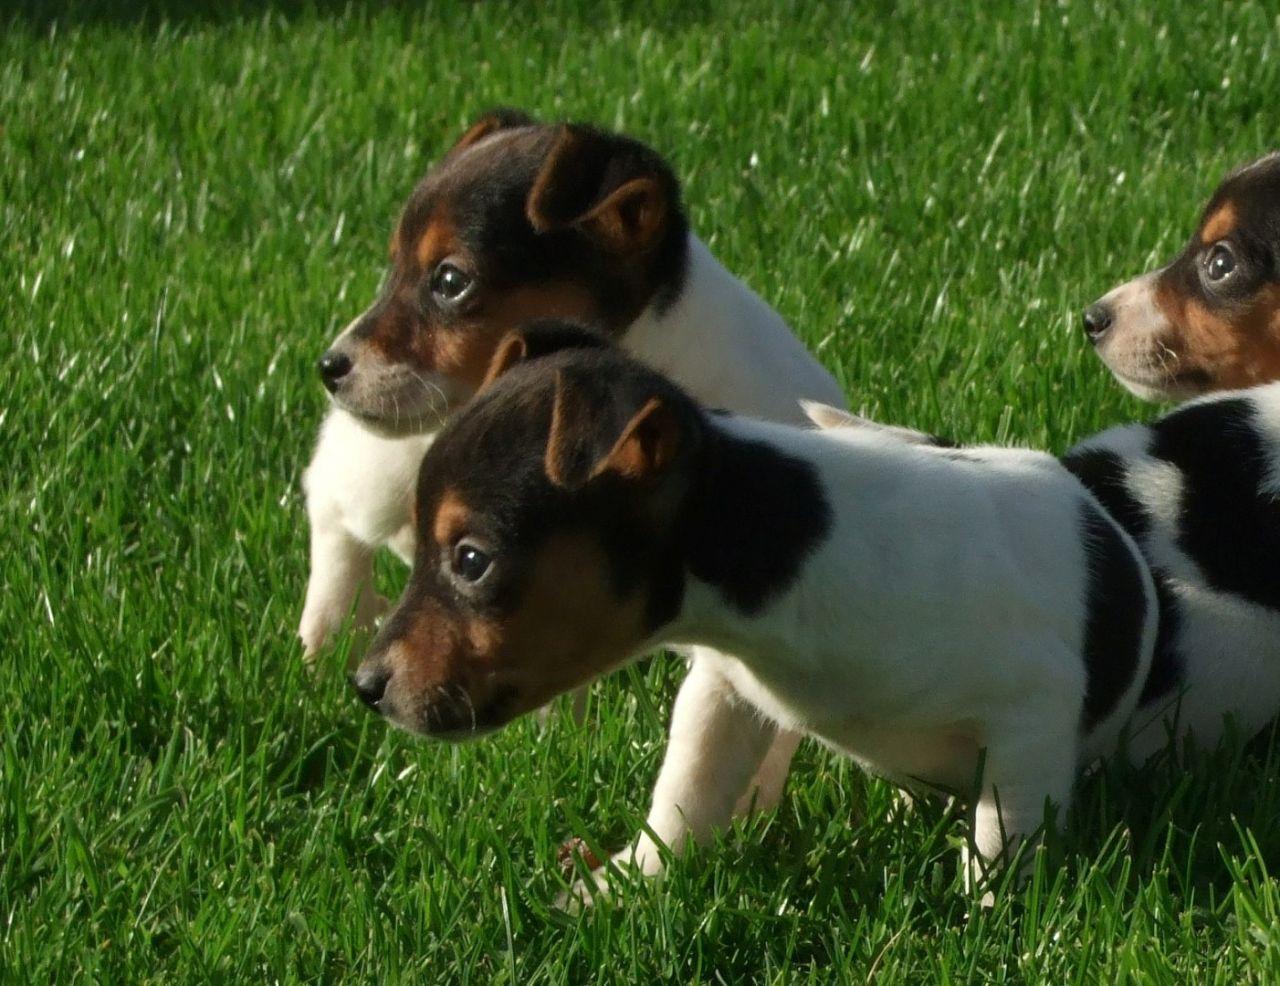 Jack Russell Terrier Puppies: Jack Stunning Jack Russell Terrier Puppies Swansea Breed